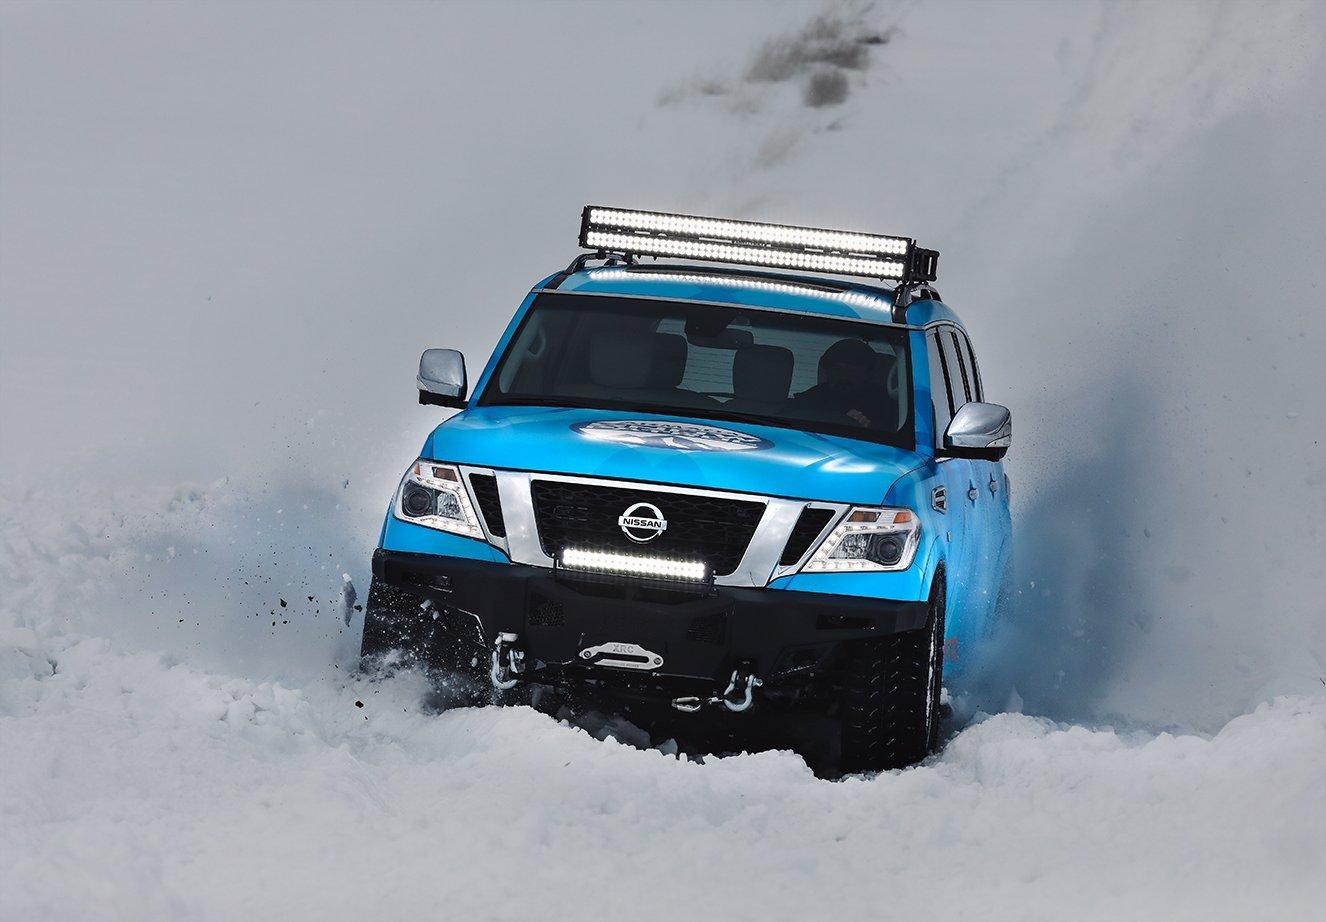 Nissan Armada Snow Patrol 2018 Chicago Auto Show